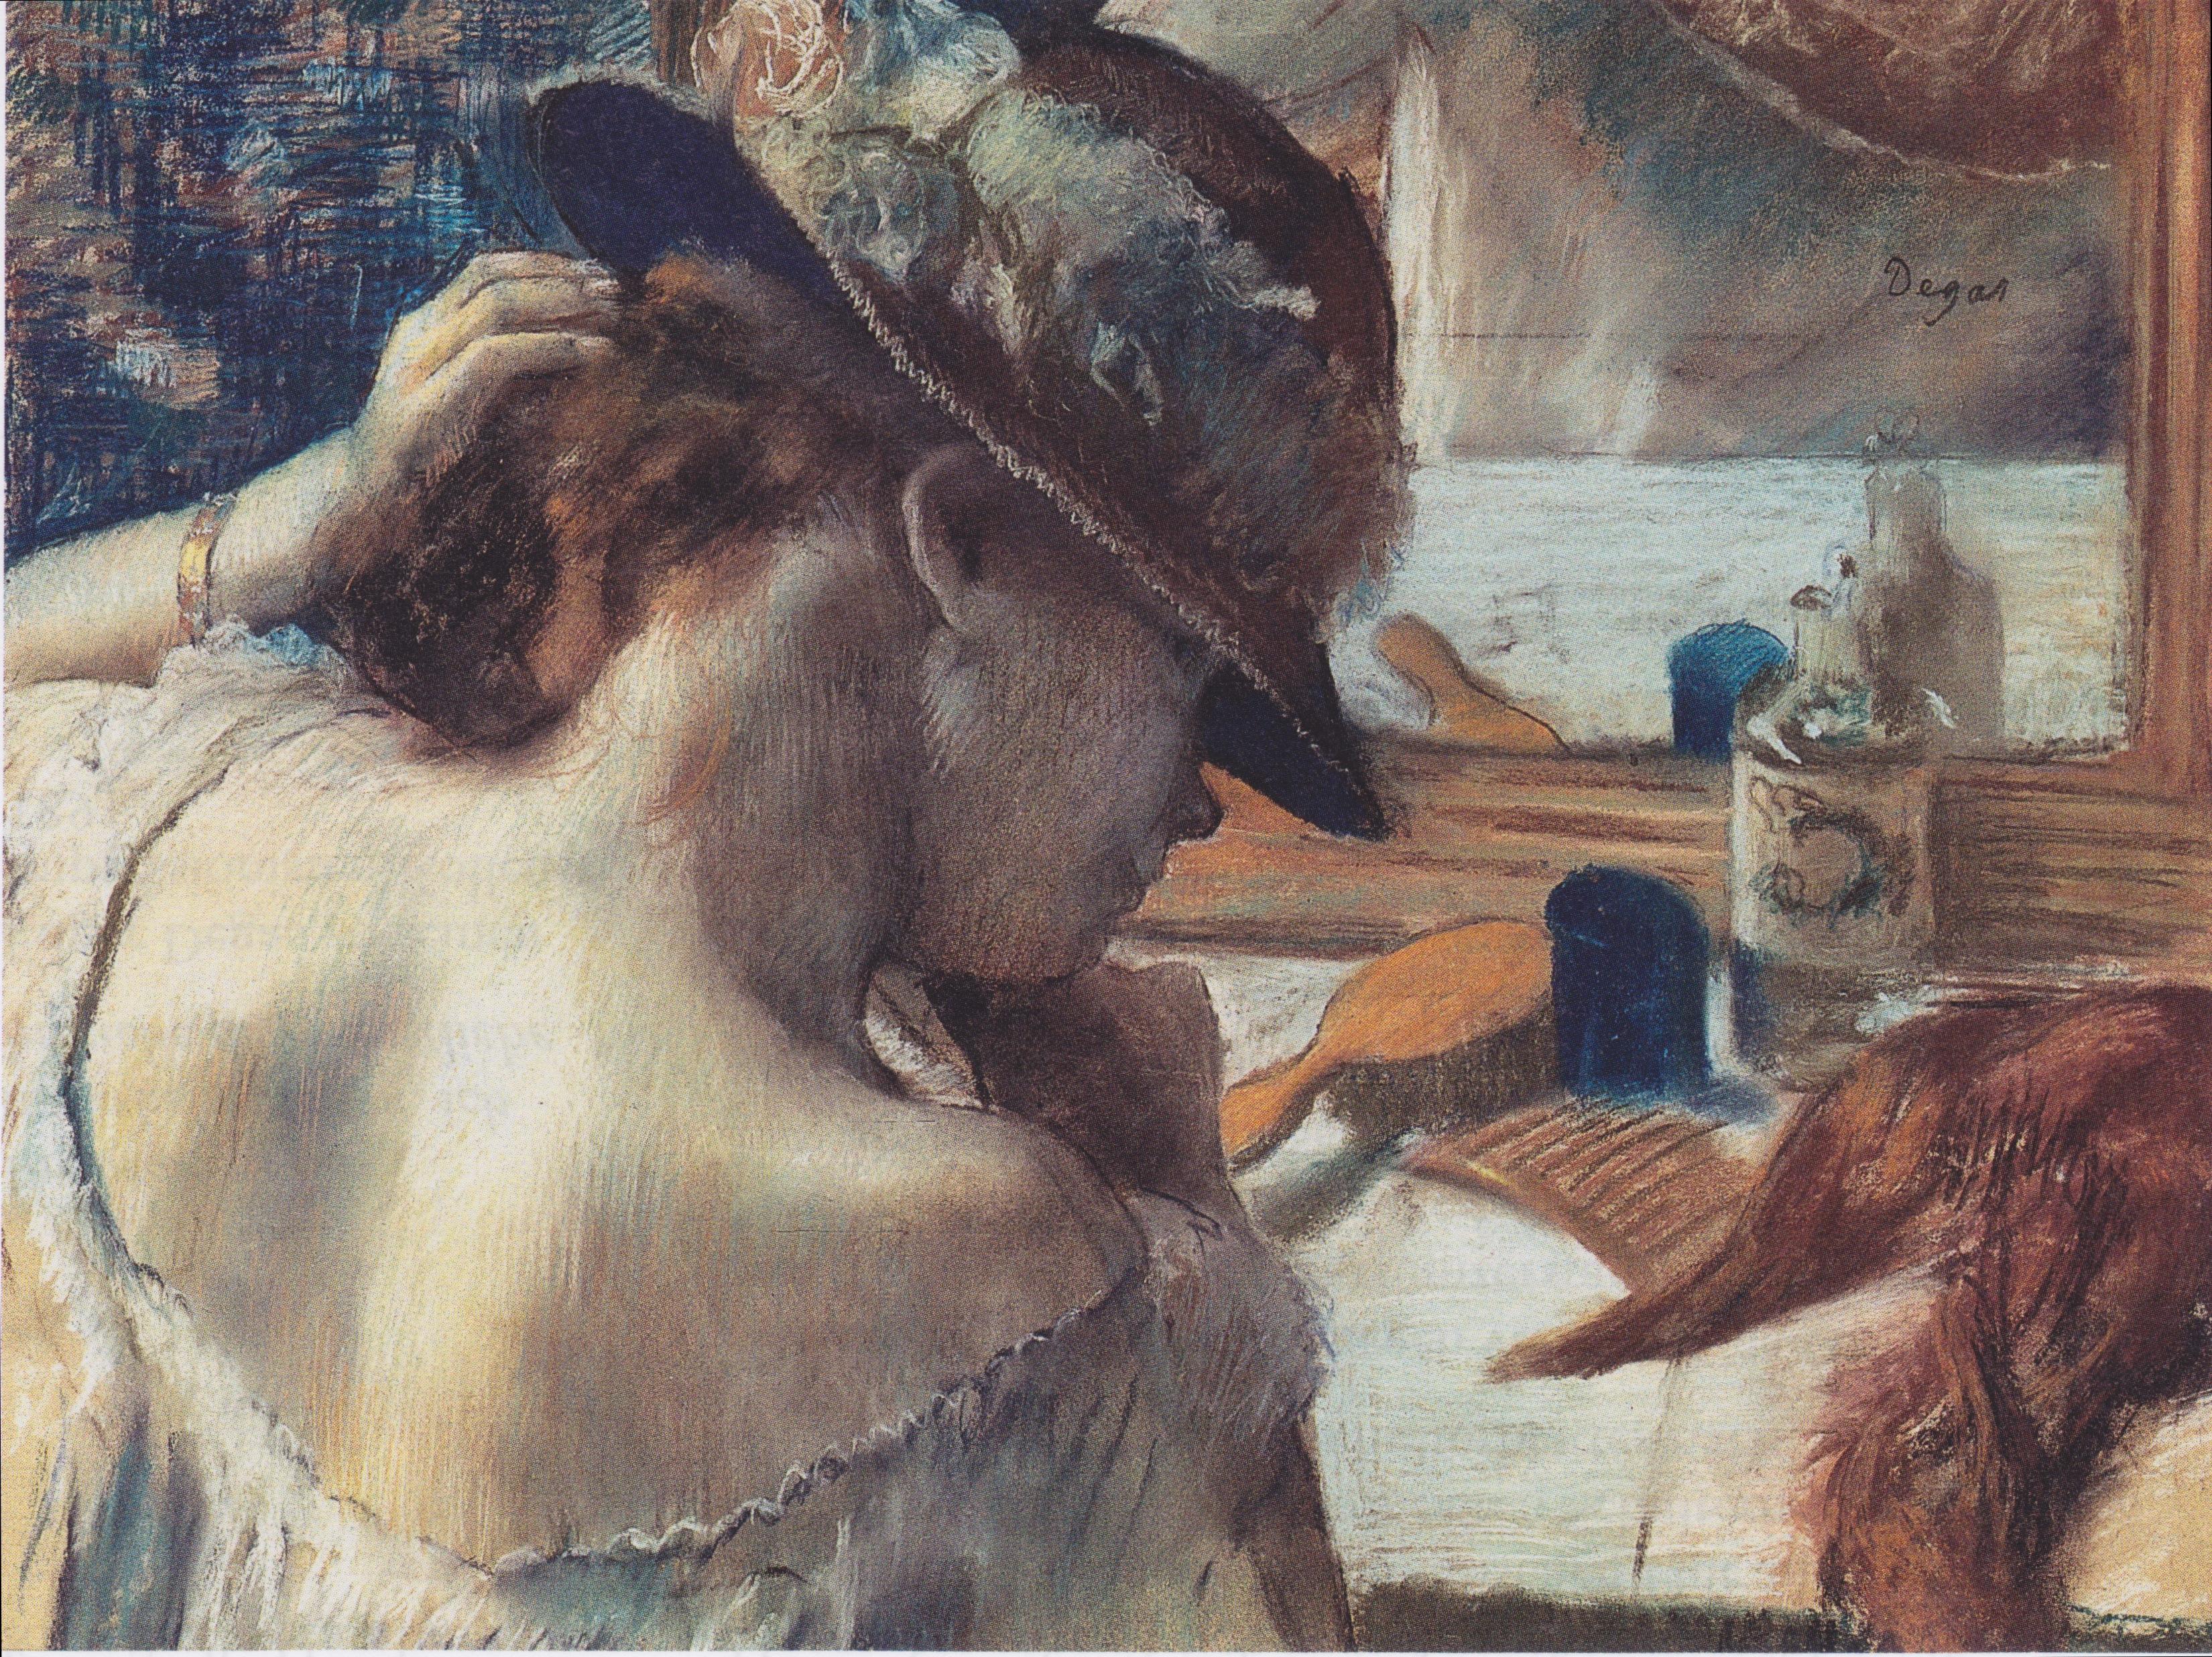 Birth Control >> File:Degas - Vor dem Spiegel - ca1899.jpeg - Wikimedia Commons